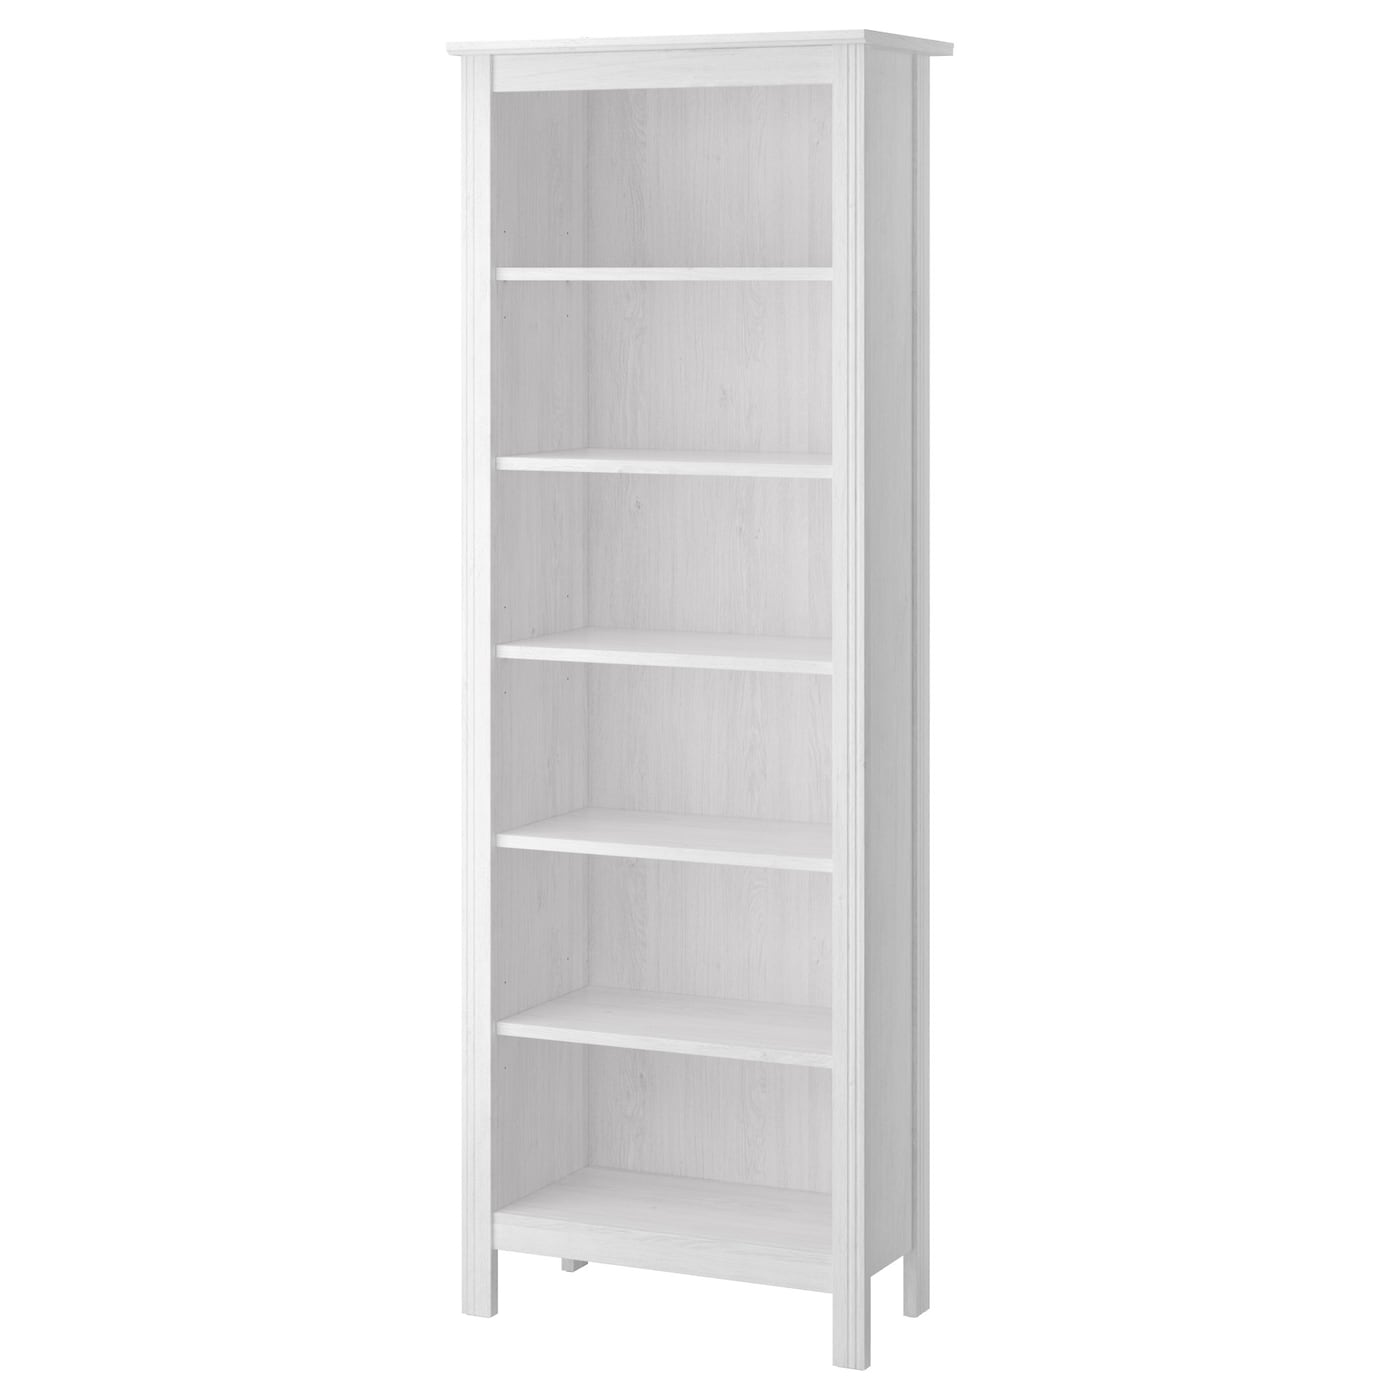 bookcases bookshelves ikea dublin. Black Bedroom Furniture Sets. Home Design Ideas